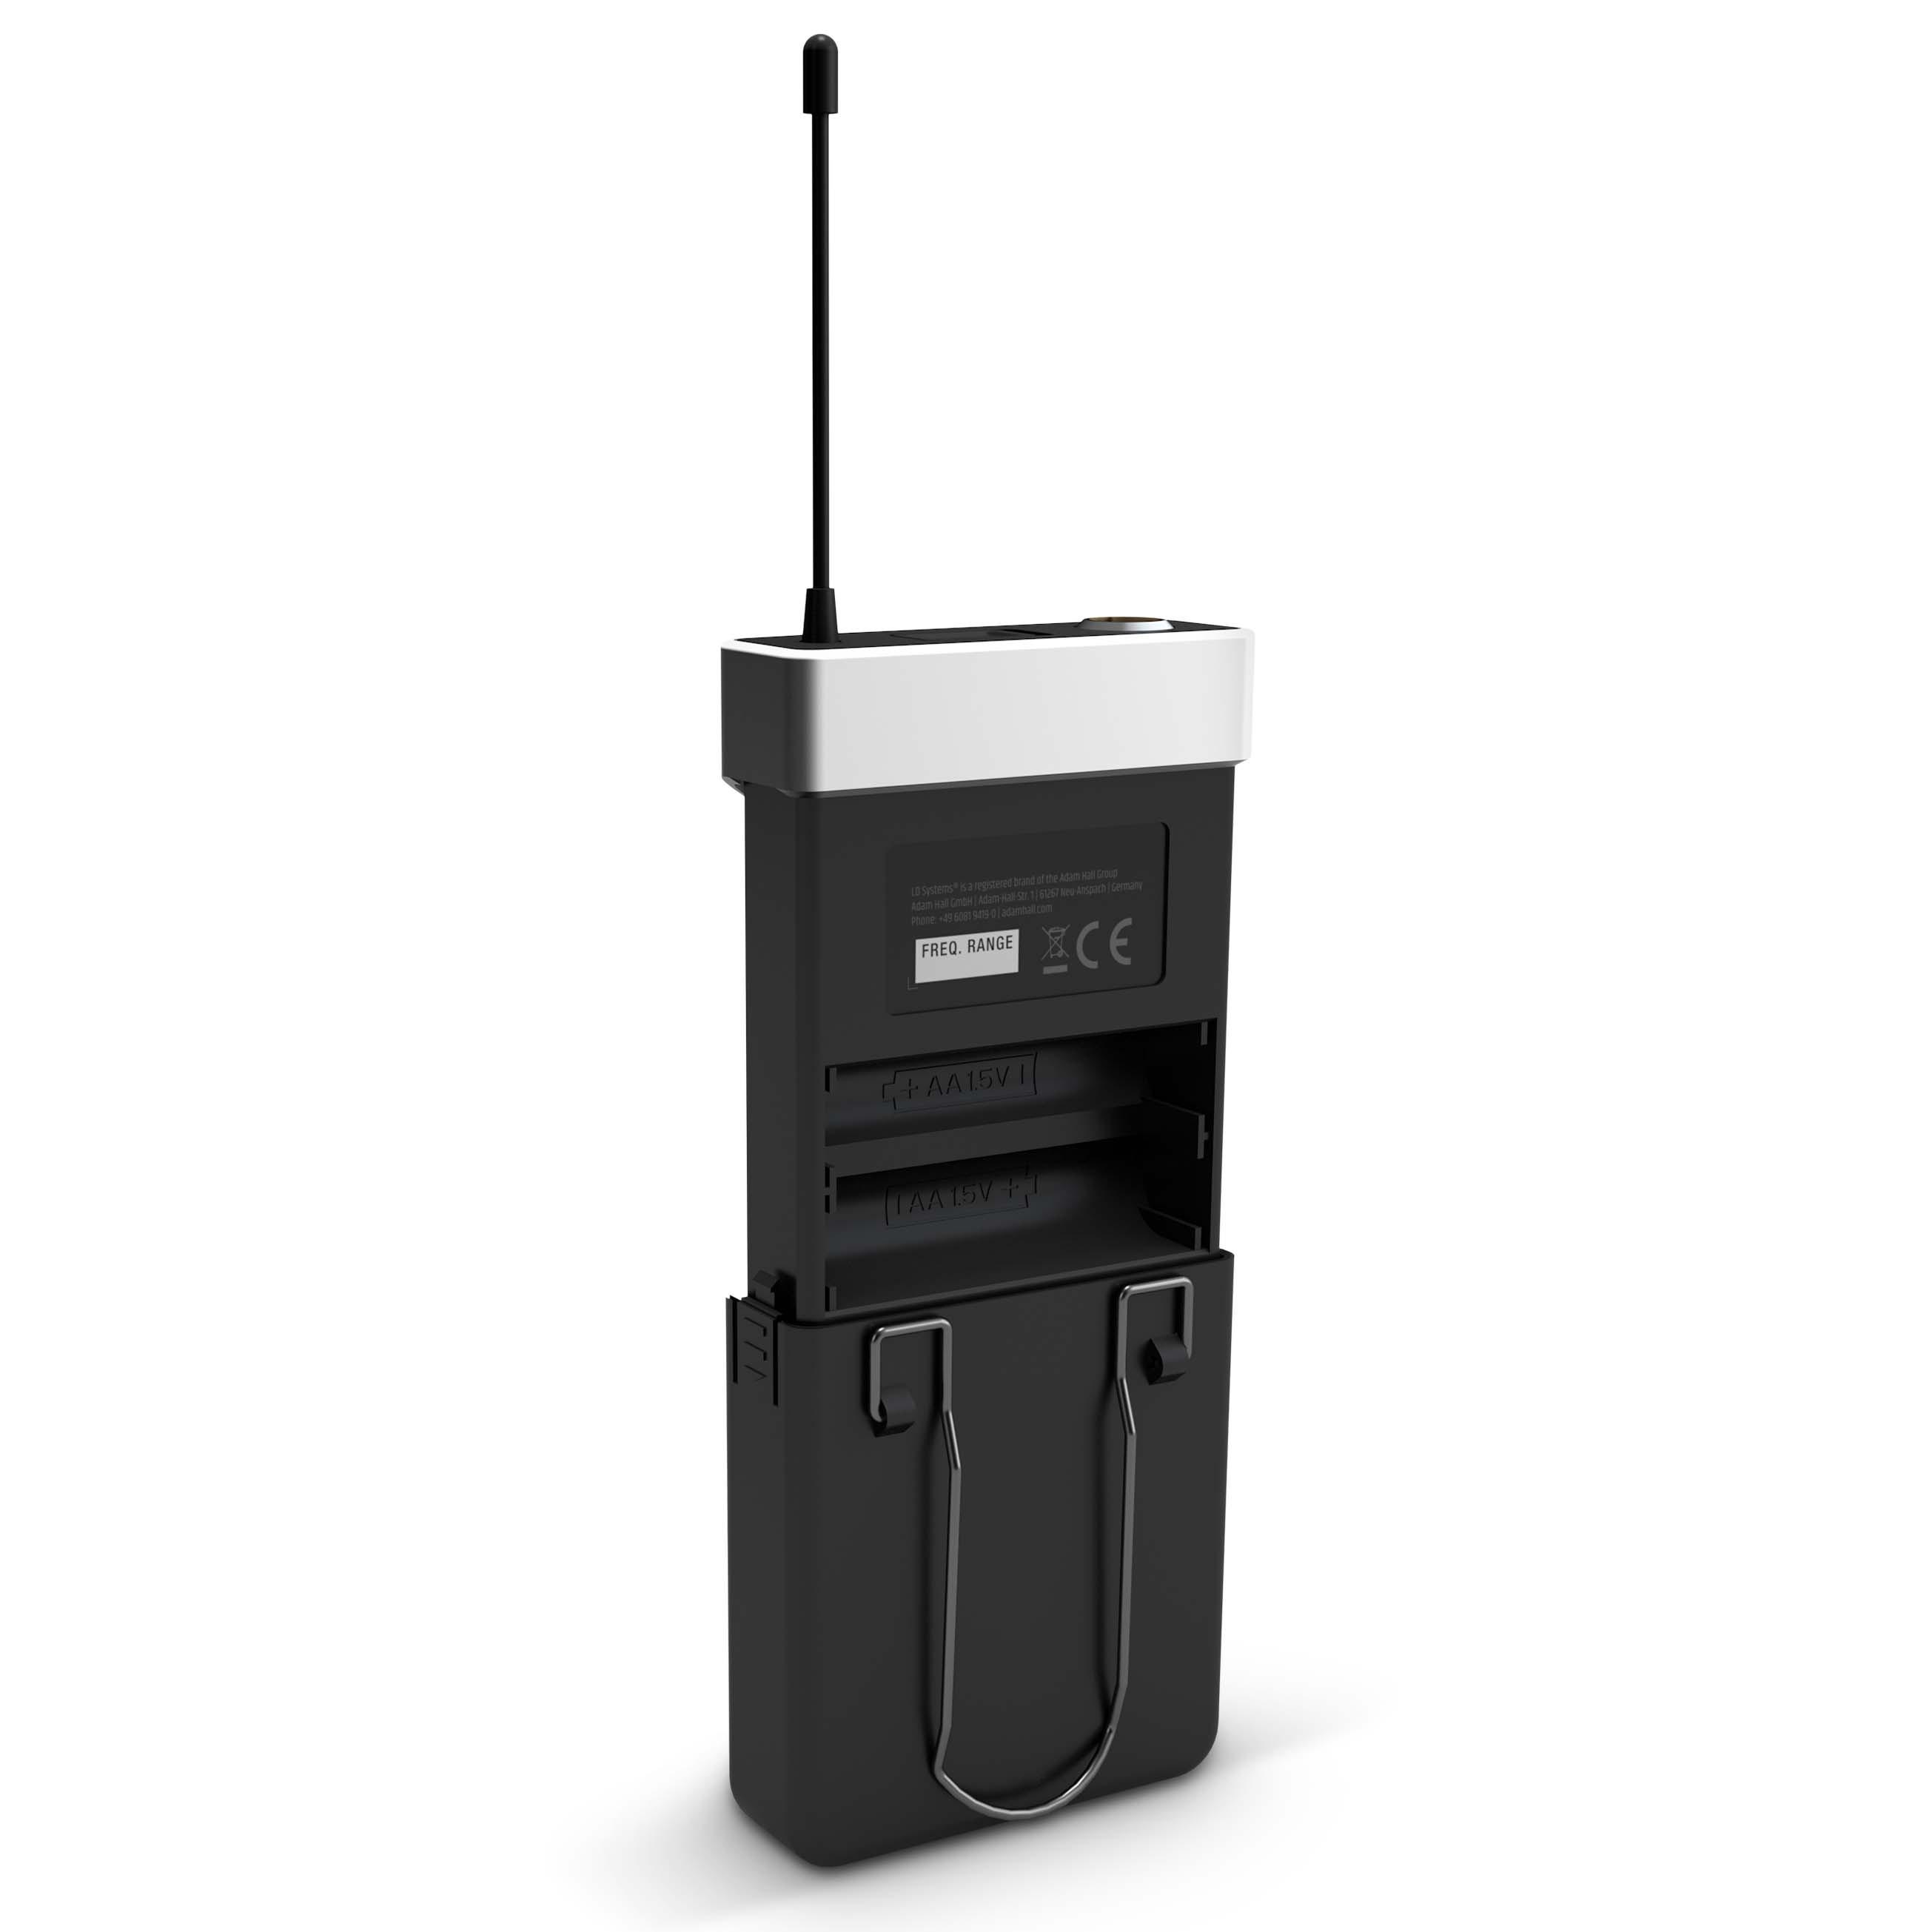 U506 BPHH 2 Funkmikrofon System mit 2 x Bodypack und 2 x Headset beigefarben